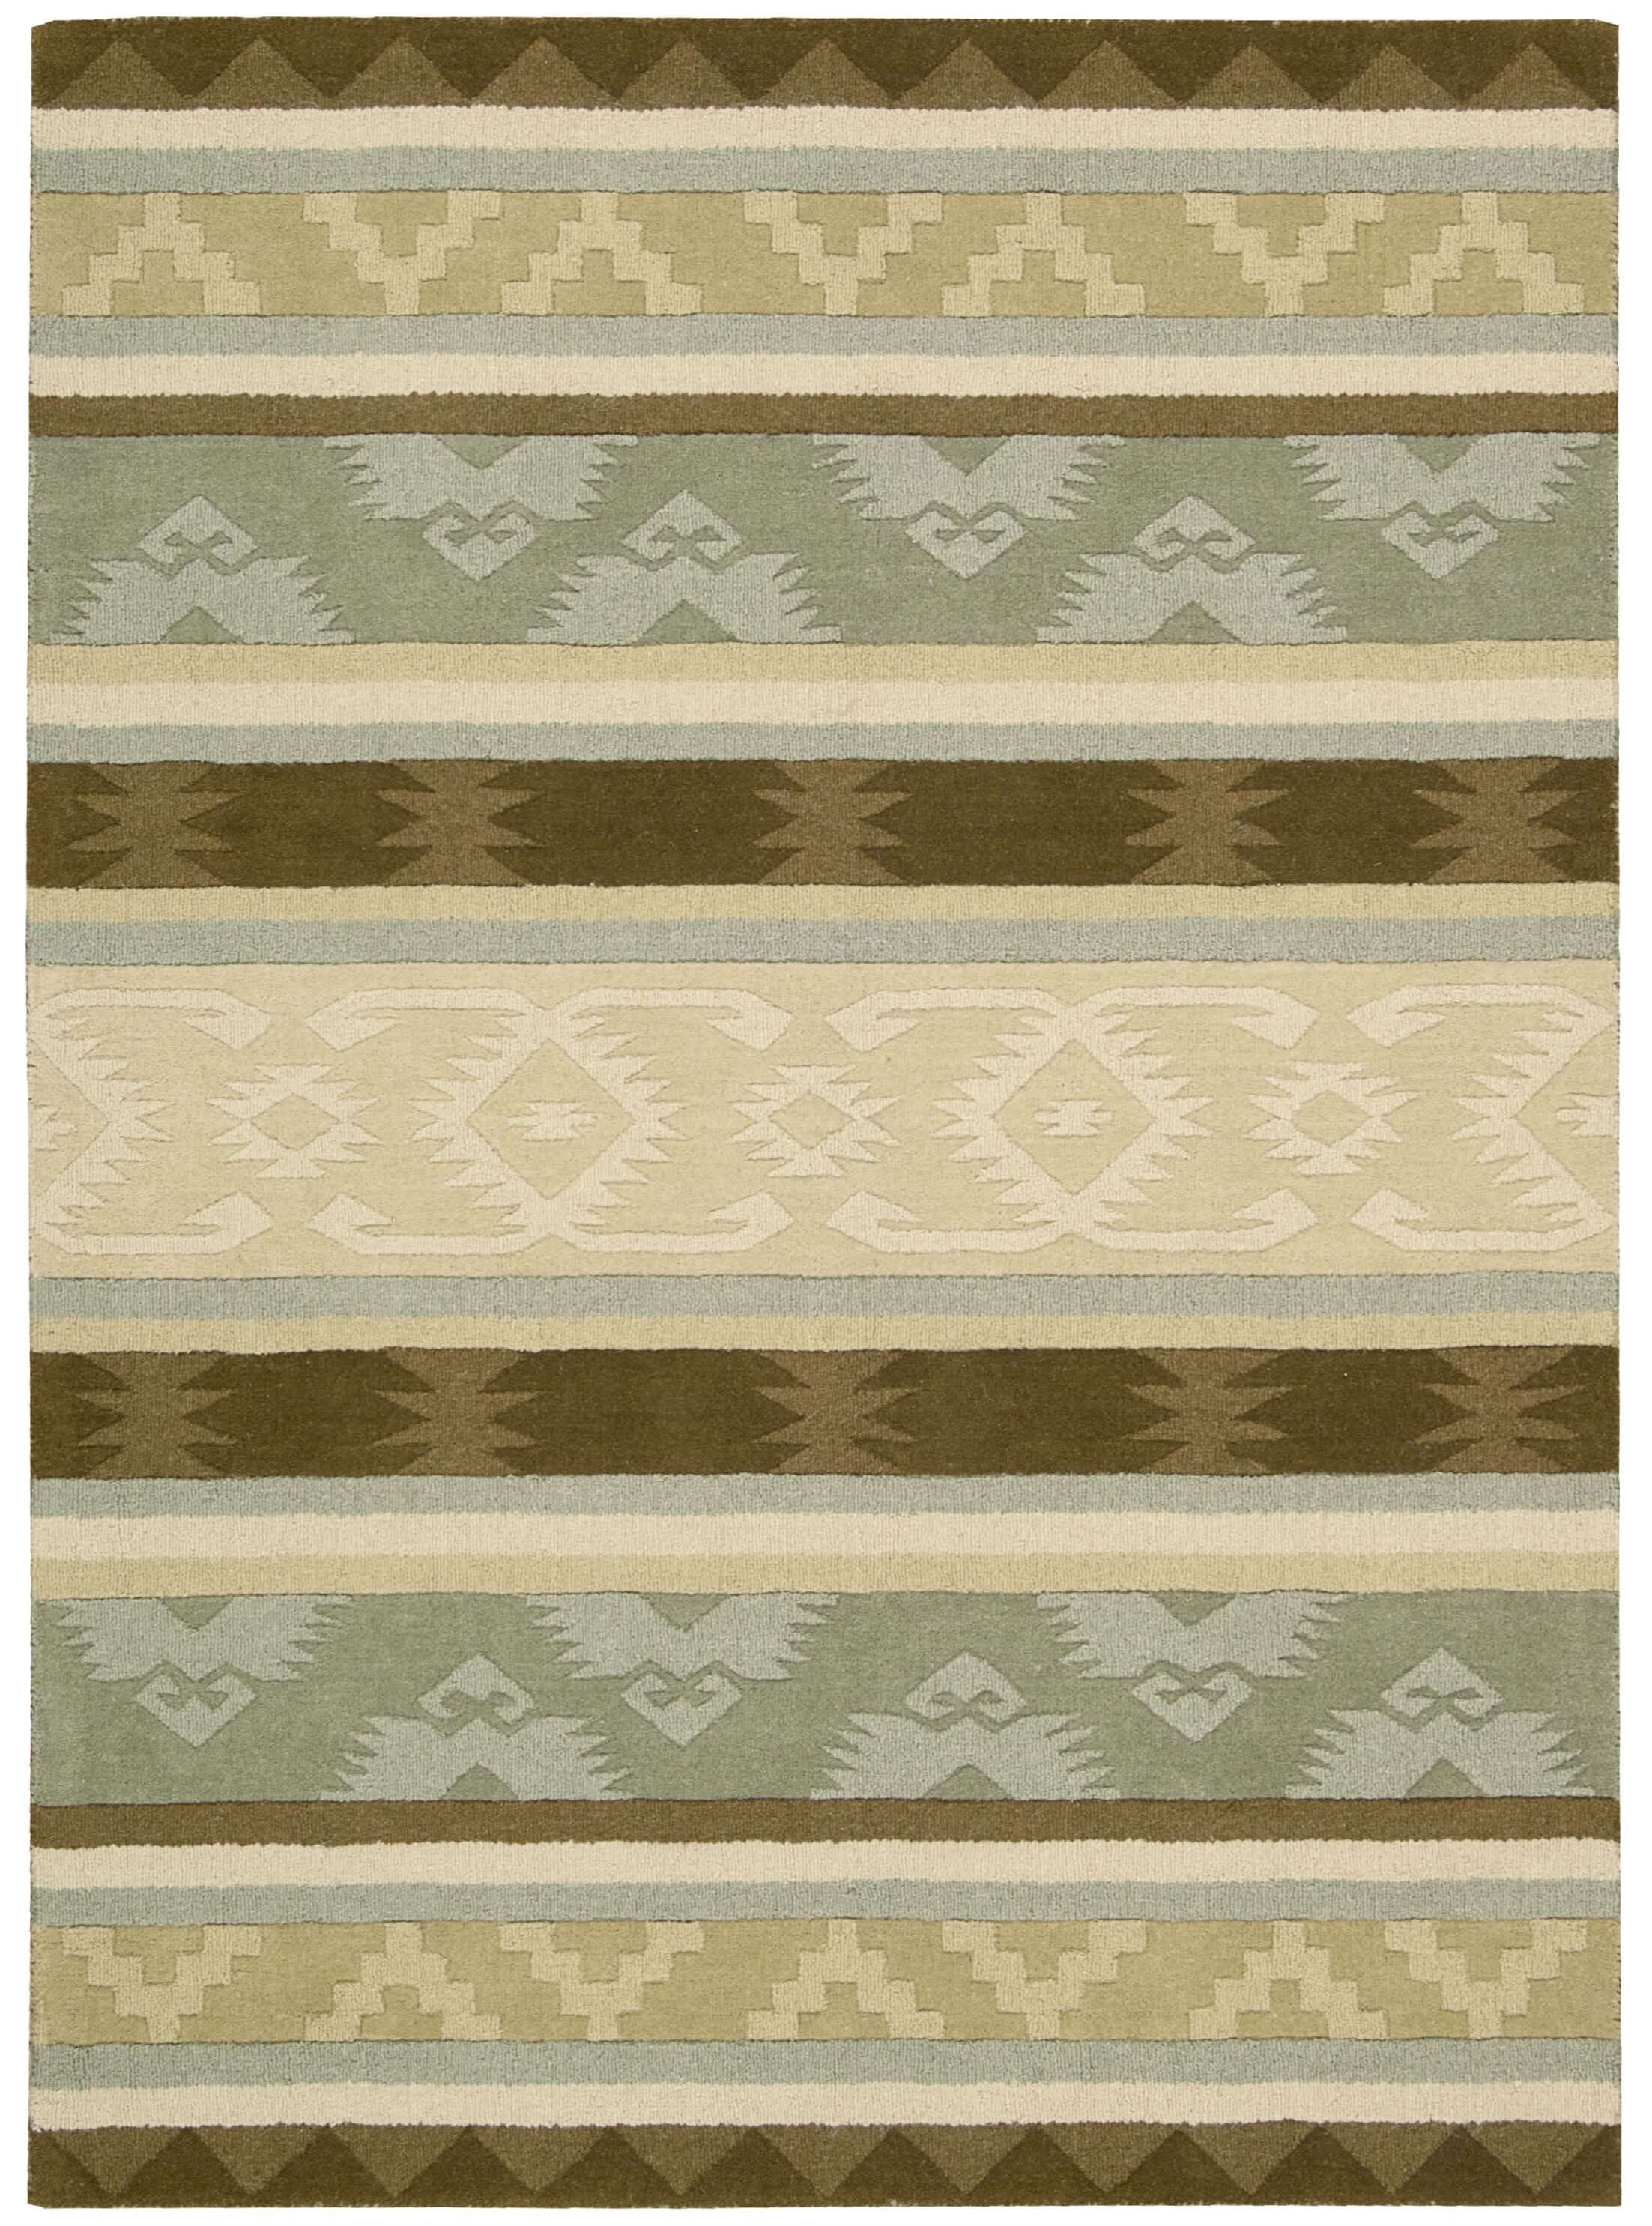 Atna Hand-Tufted Sage Area Rug Rug Size: Rectangle 8' x 10'6